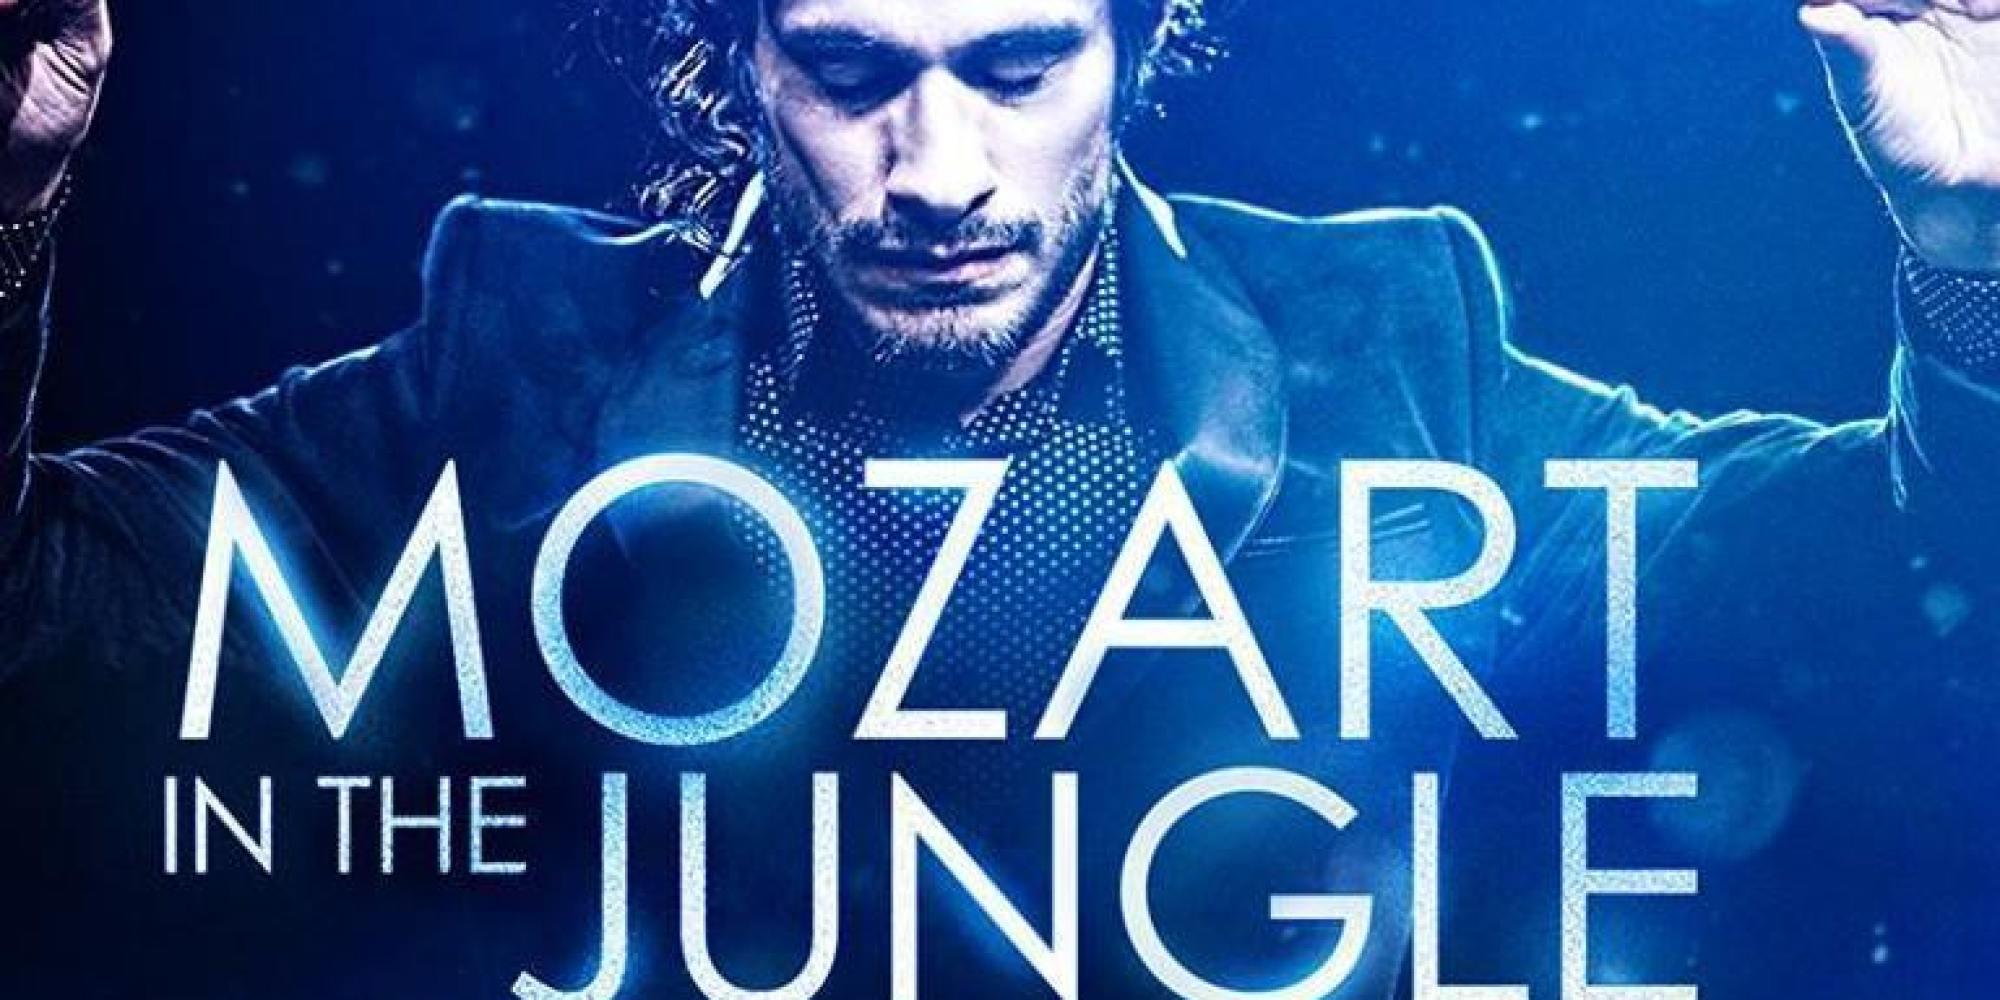 Mozart-in-the-Jungle-Picrow-Amazon-Studios-15